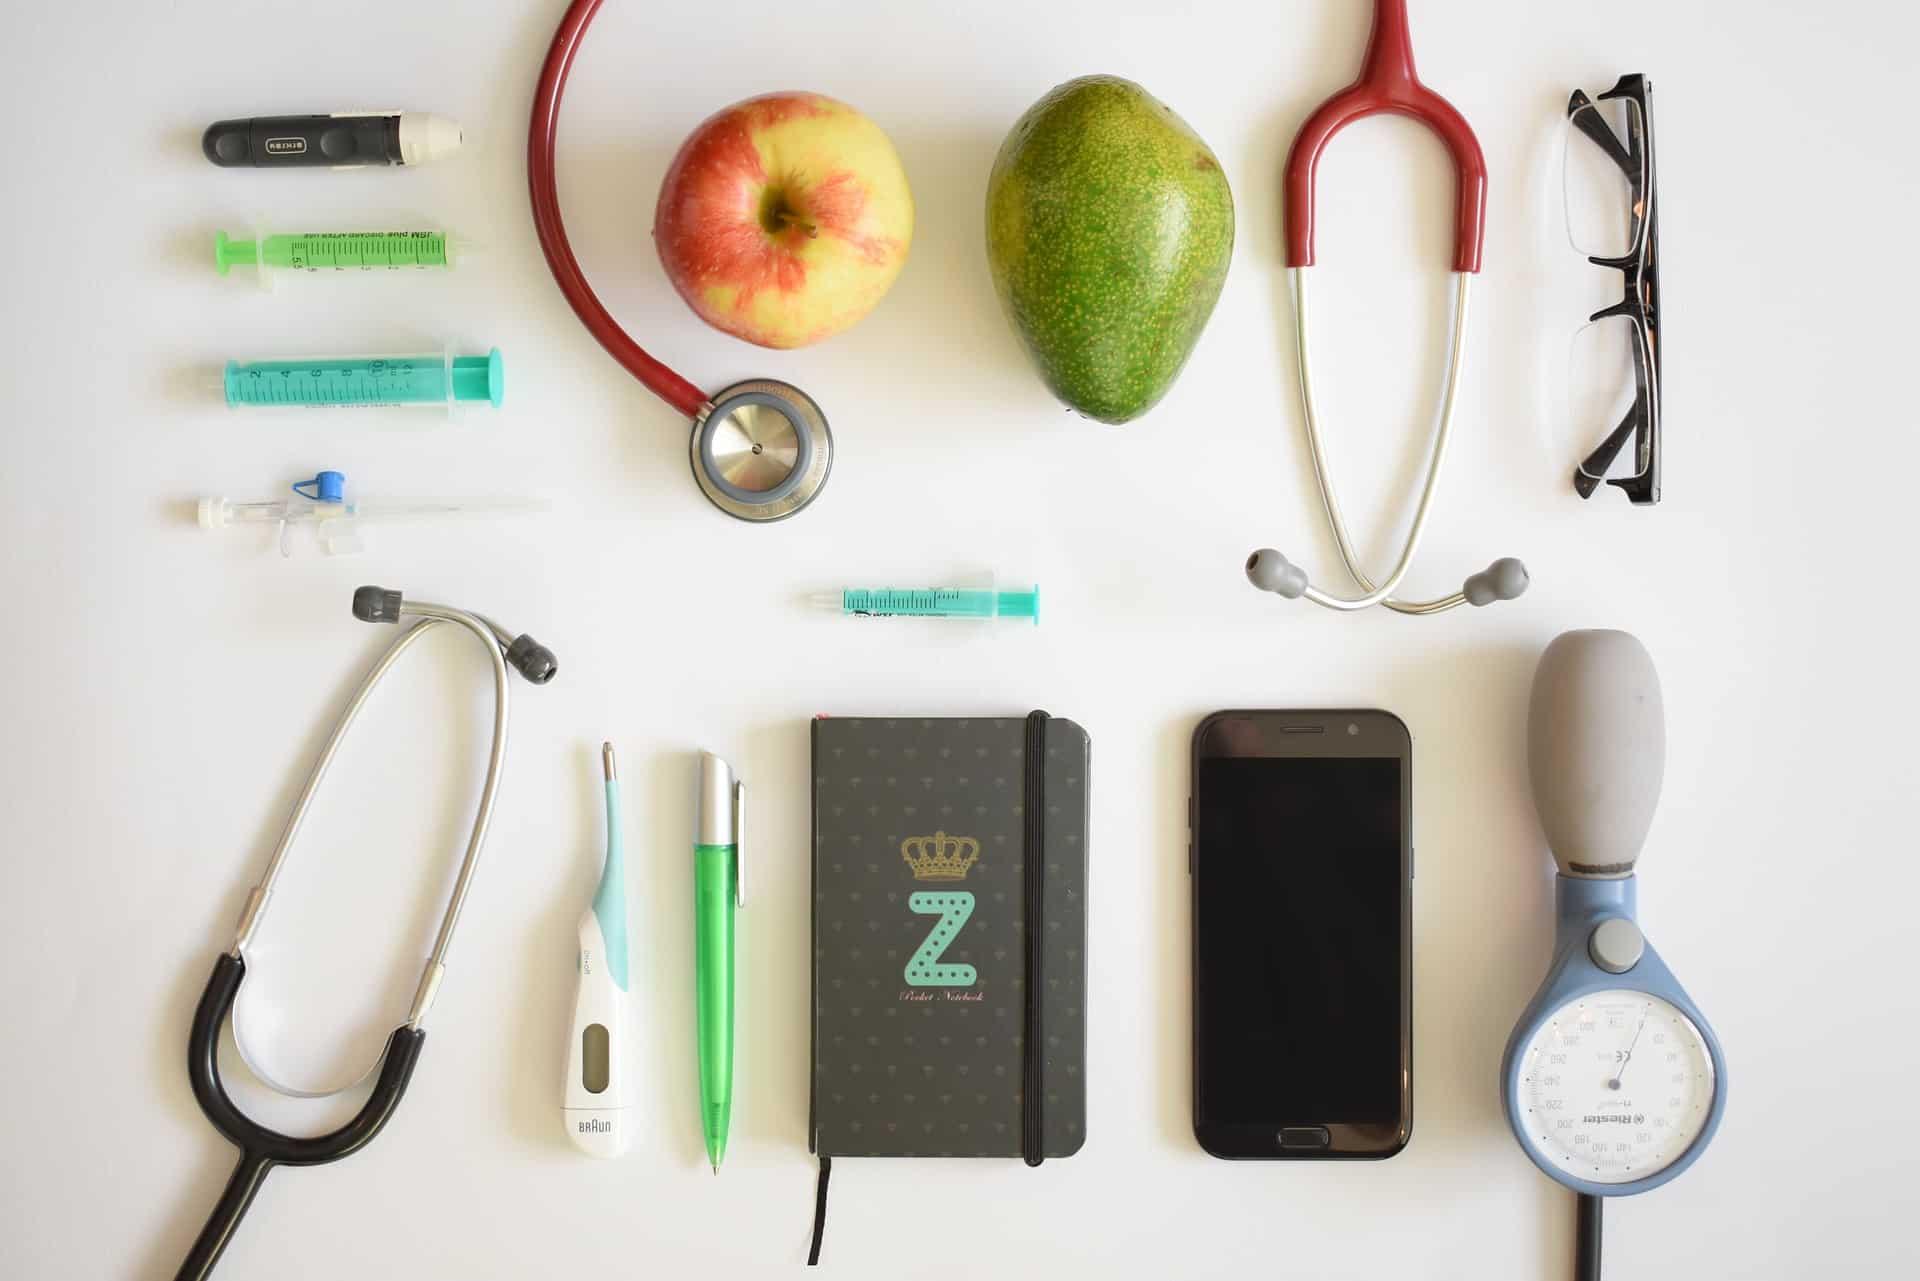 magas vérnyomás 3 fokos testnevelés magas vérnyomás és skizofrénia